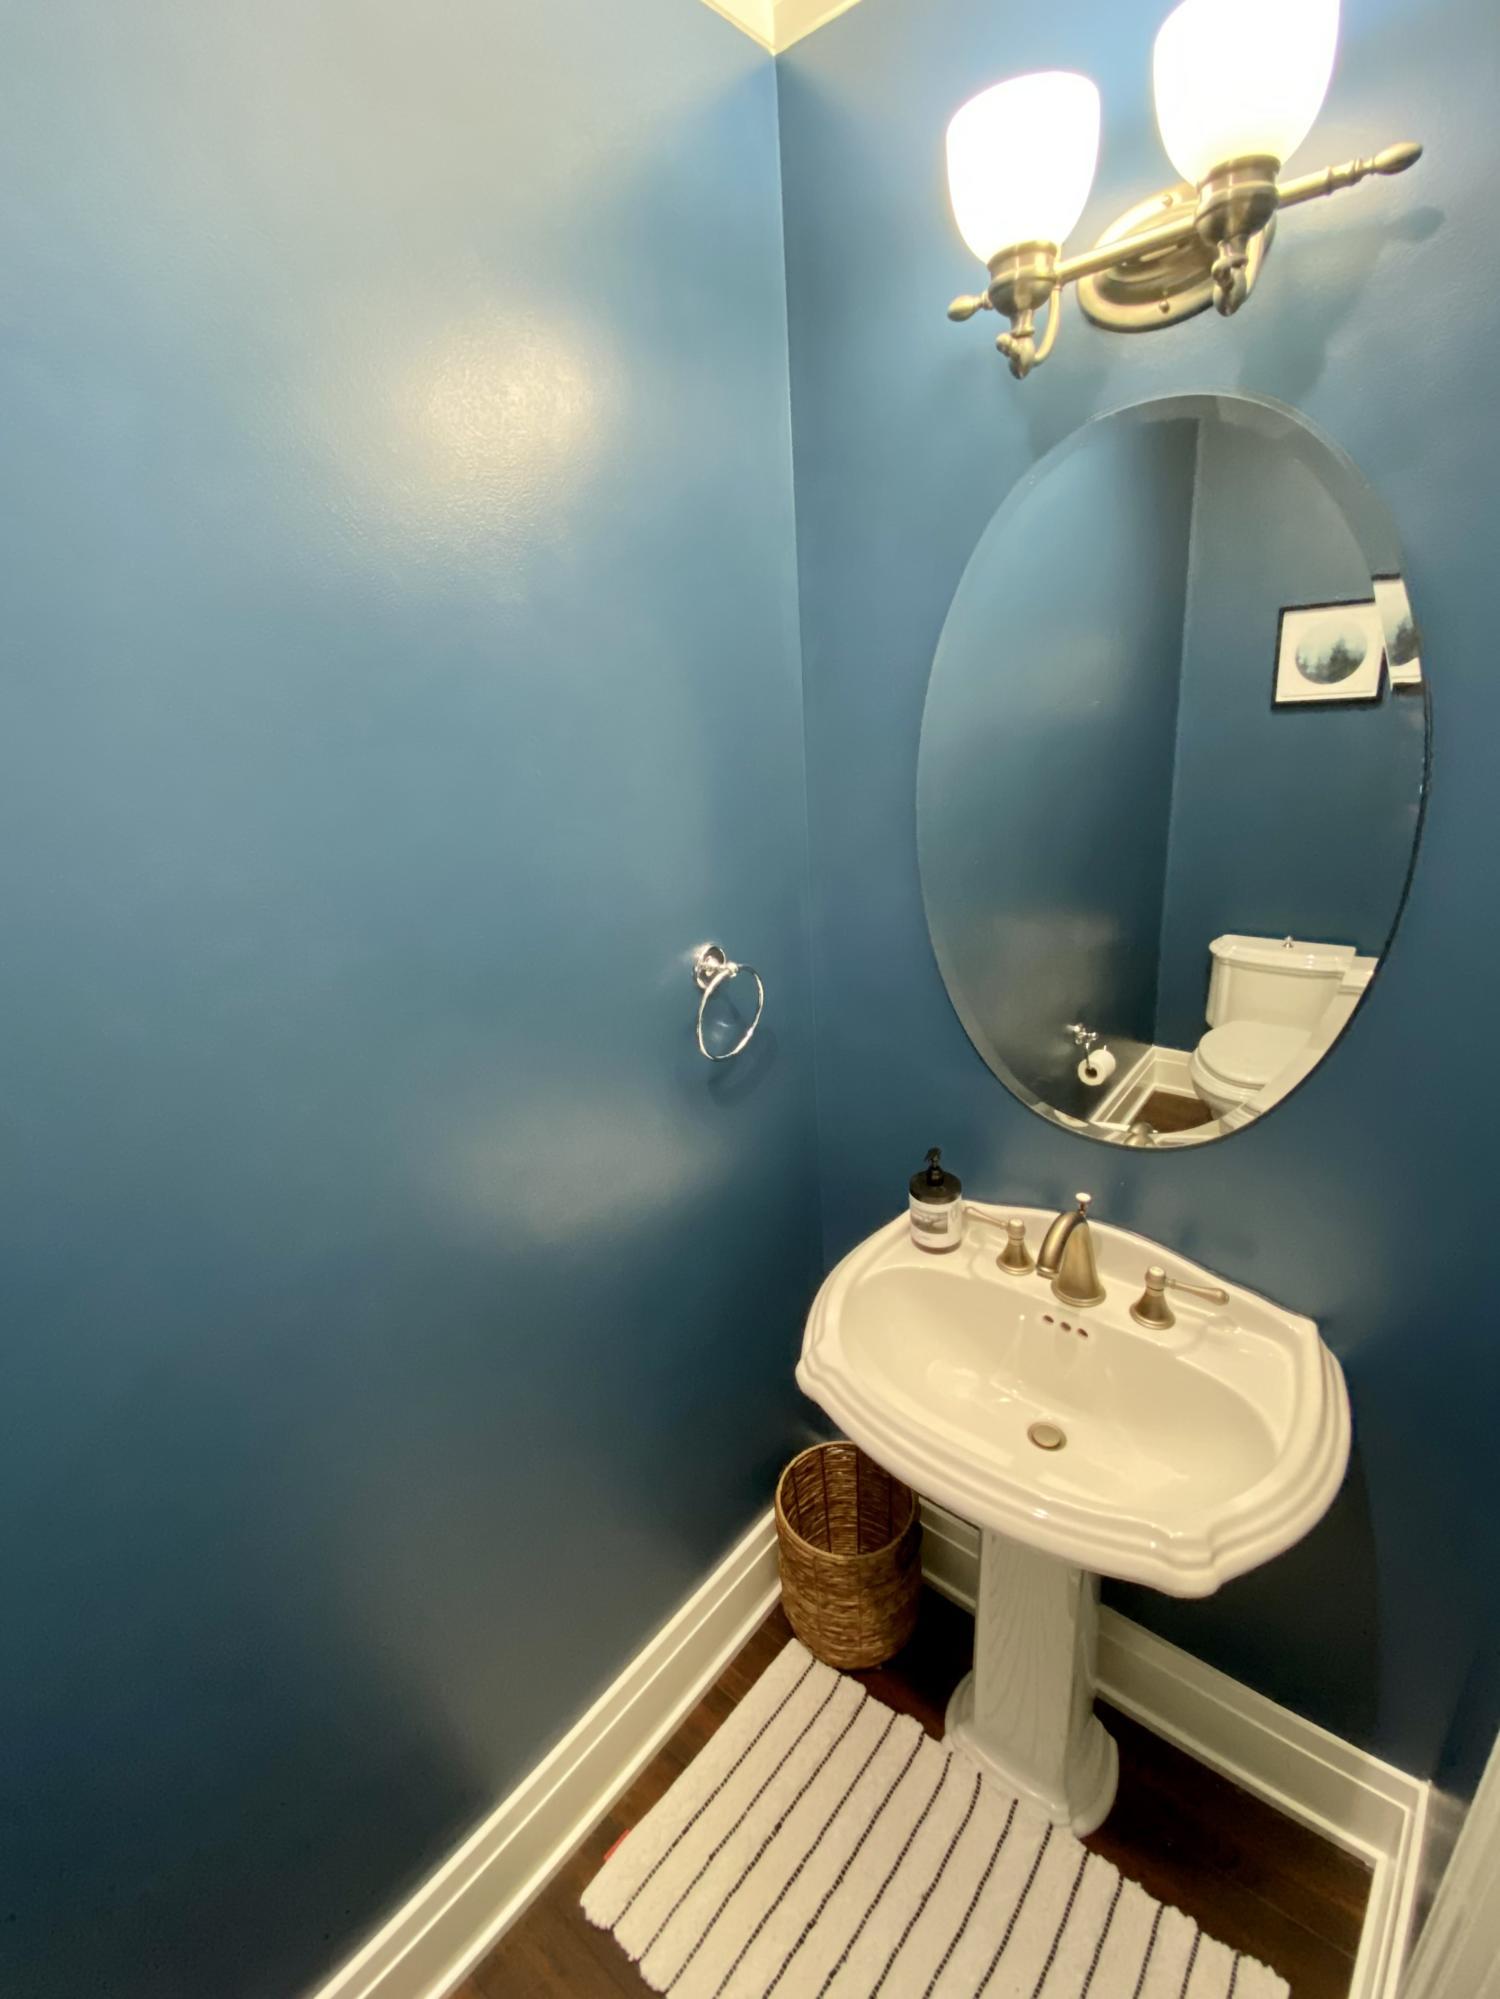 Tides Condominiums Homes For Sale - 216 Cooper River, Mount Pleasant, SC - 25